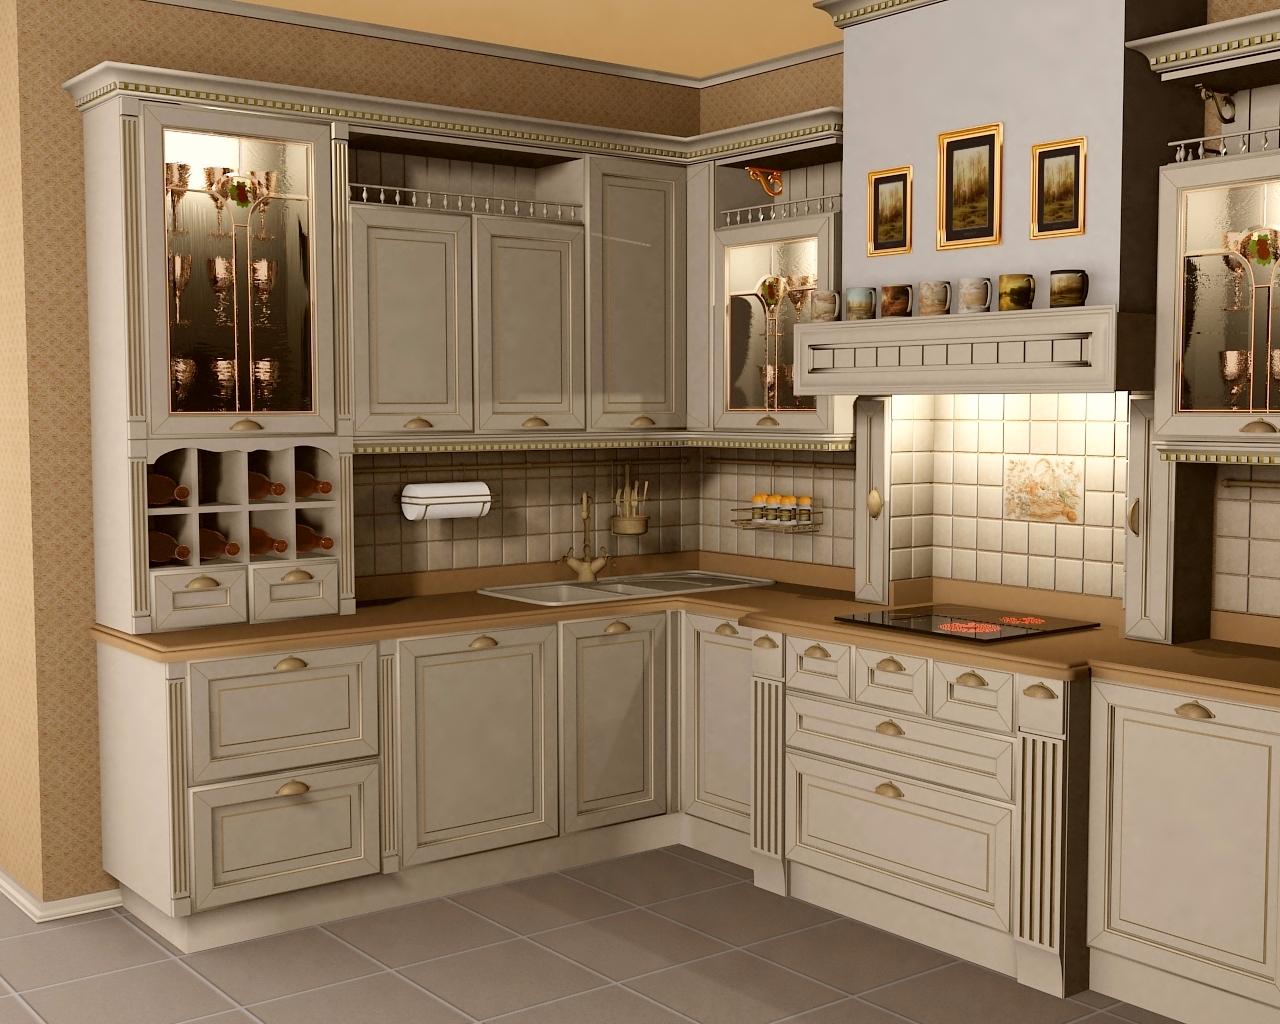 Картинки по запросу кухня классика